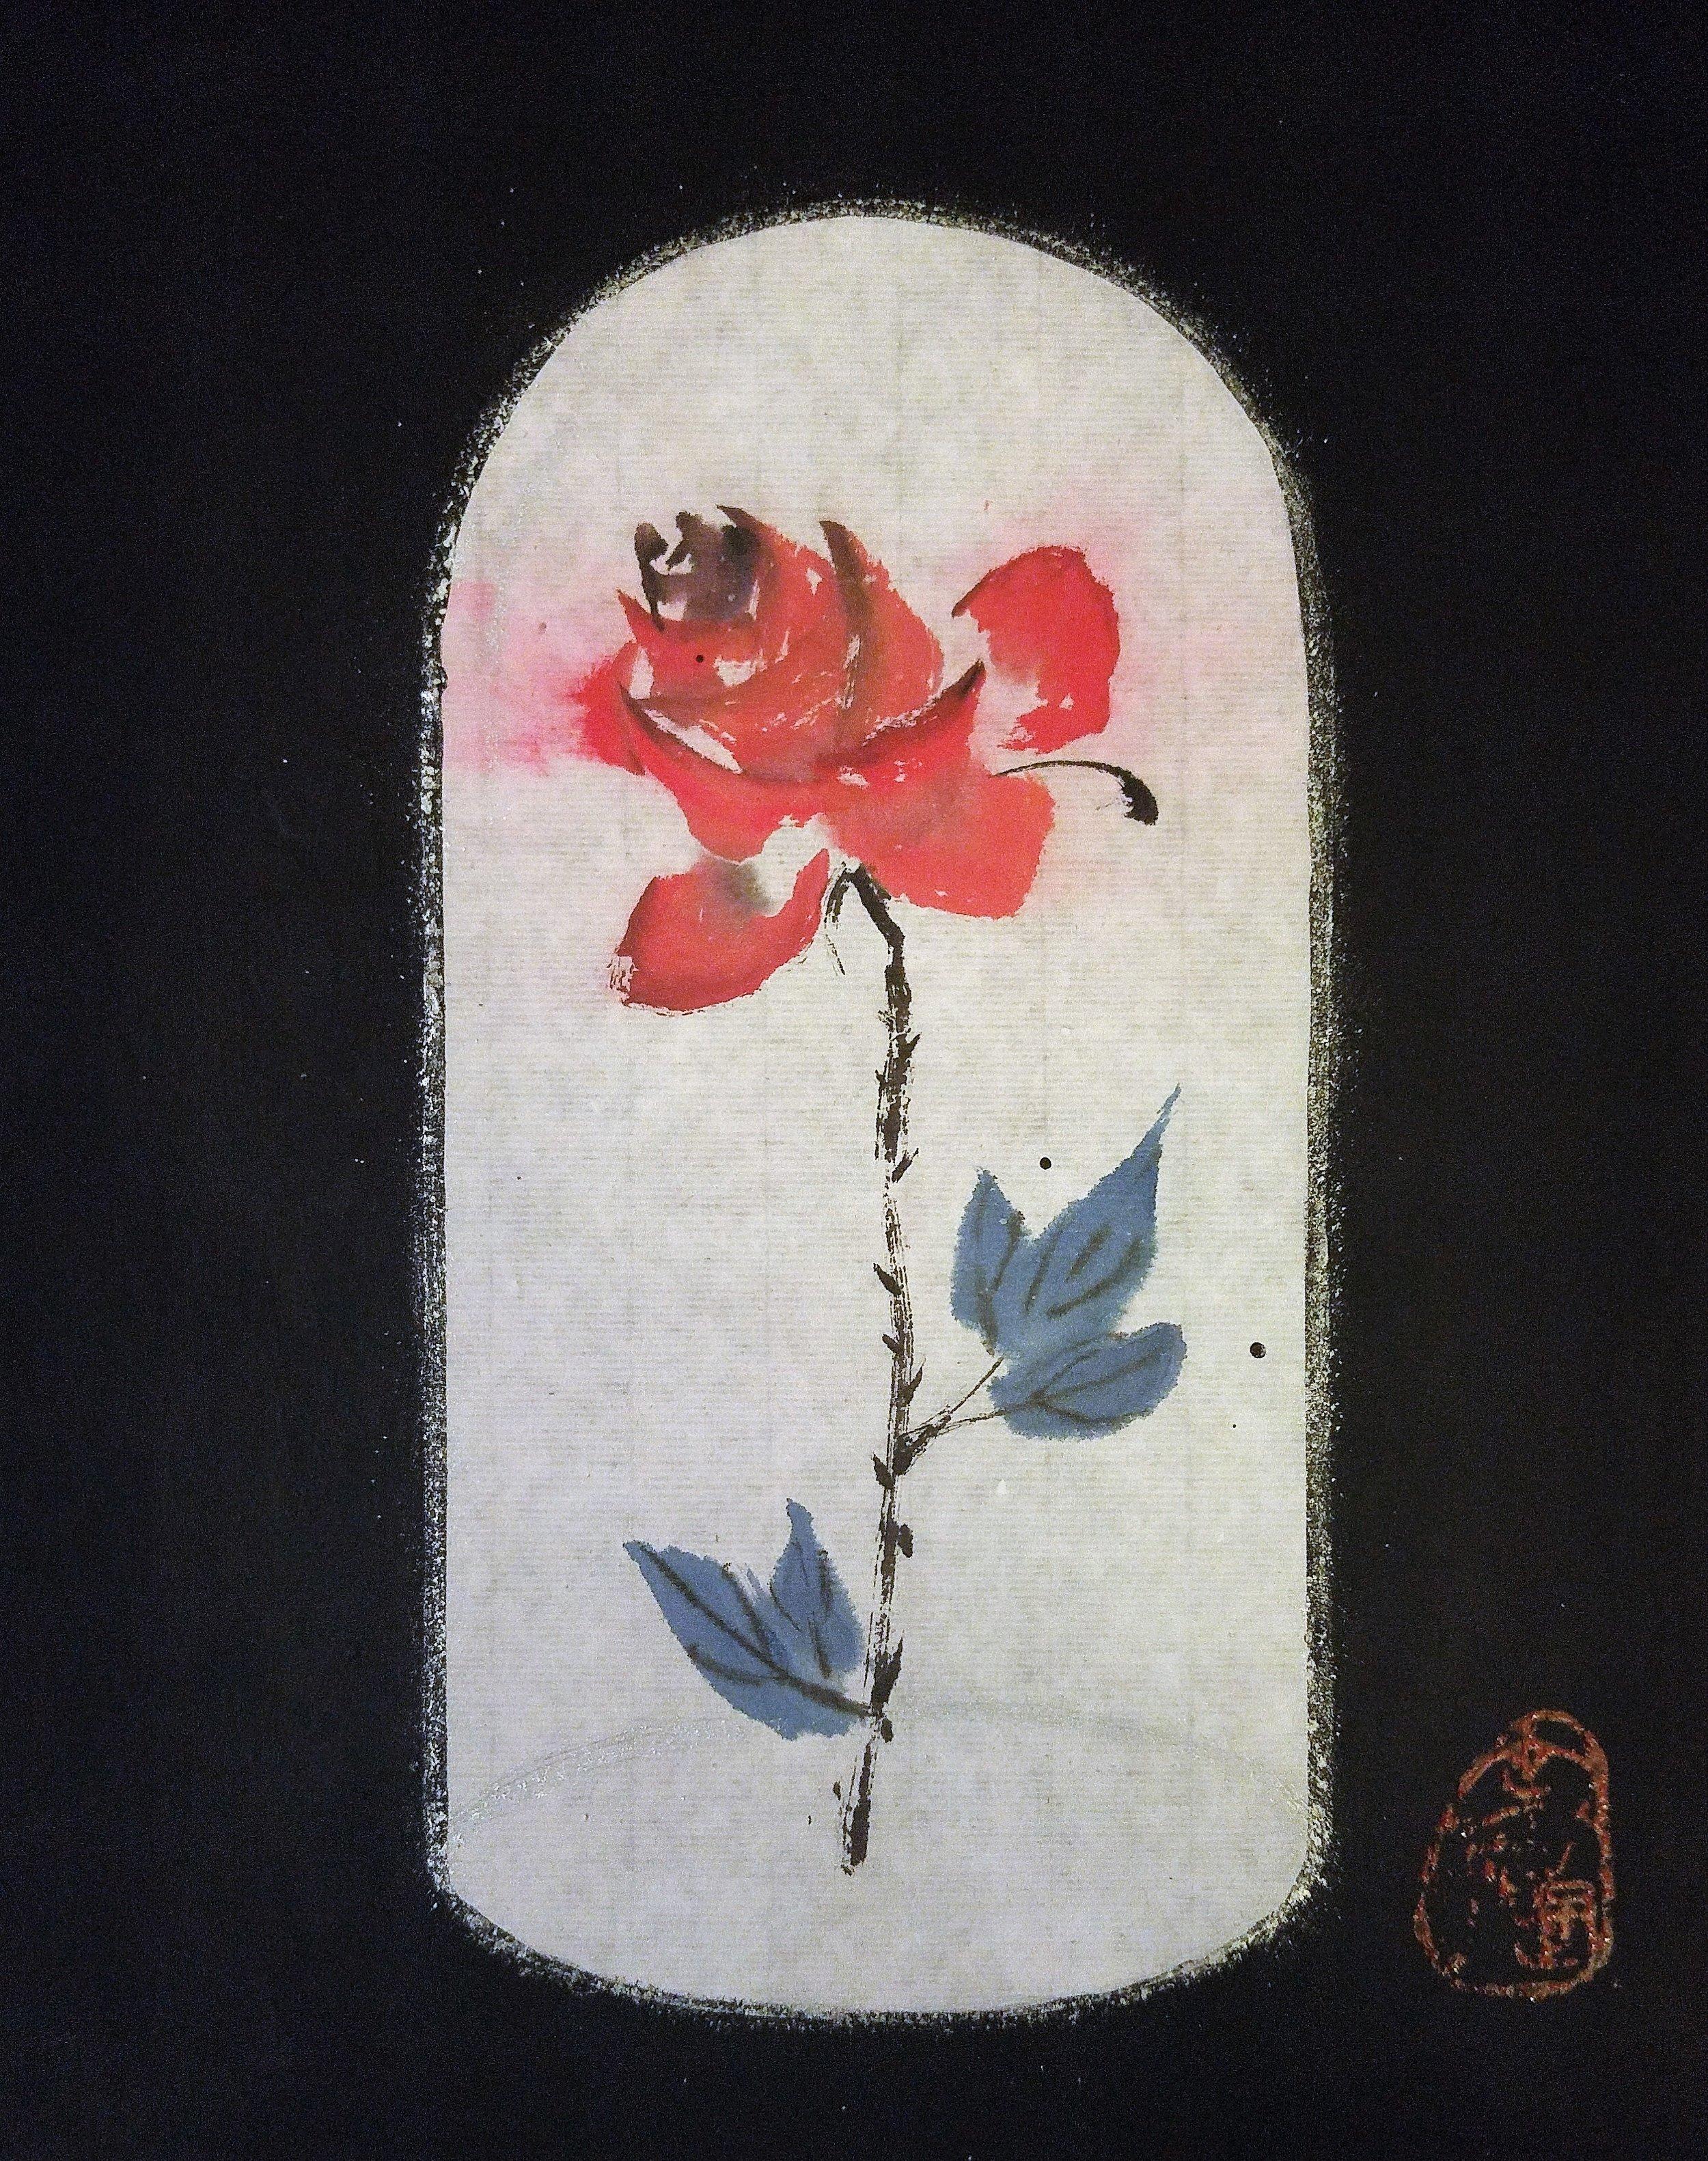 La Vie en Rose-Inspired by Edith Piaf, 12 x 9.5 inches